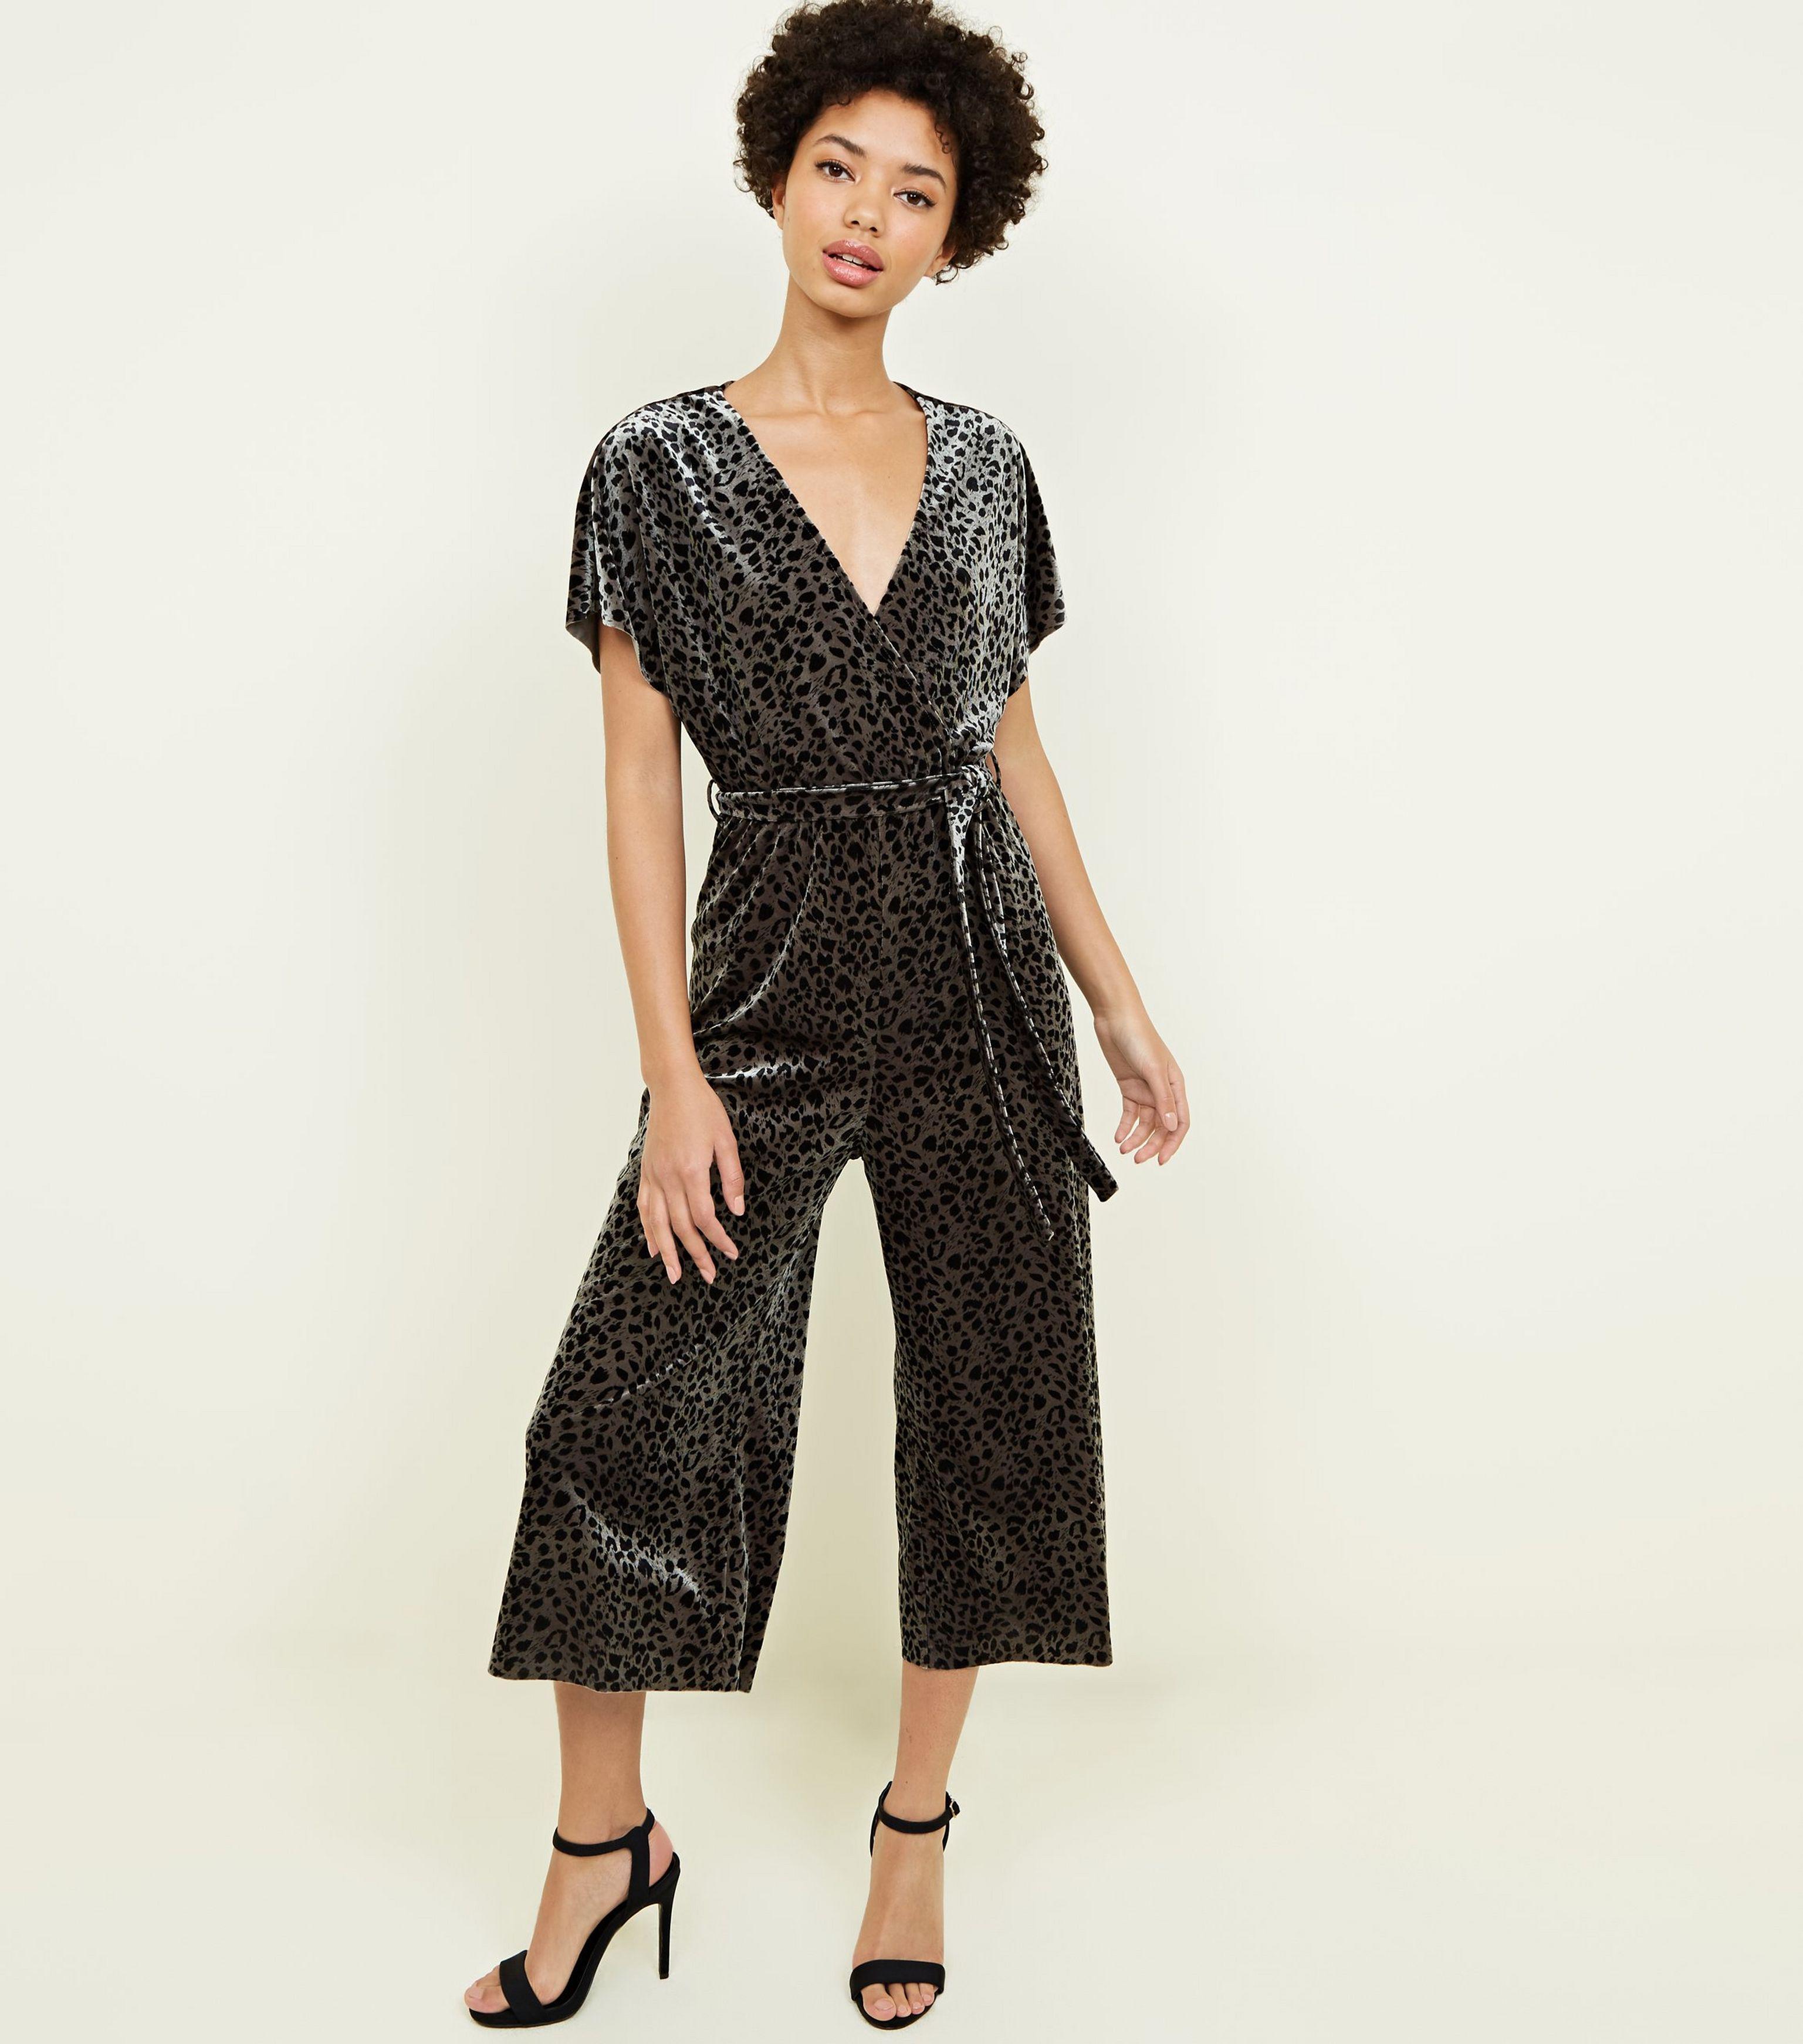 e1f5838b5b New Look Khaki Leopard Print Velvet Wrap Front Jumpsuit in Black - Lyst